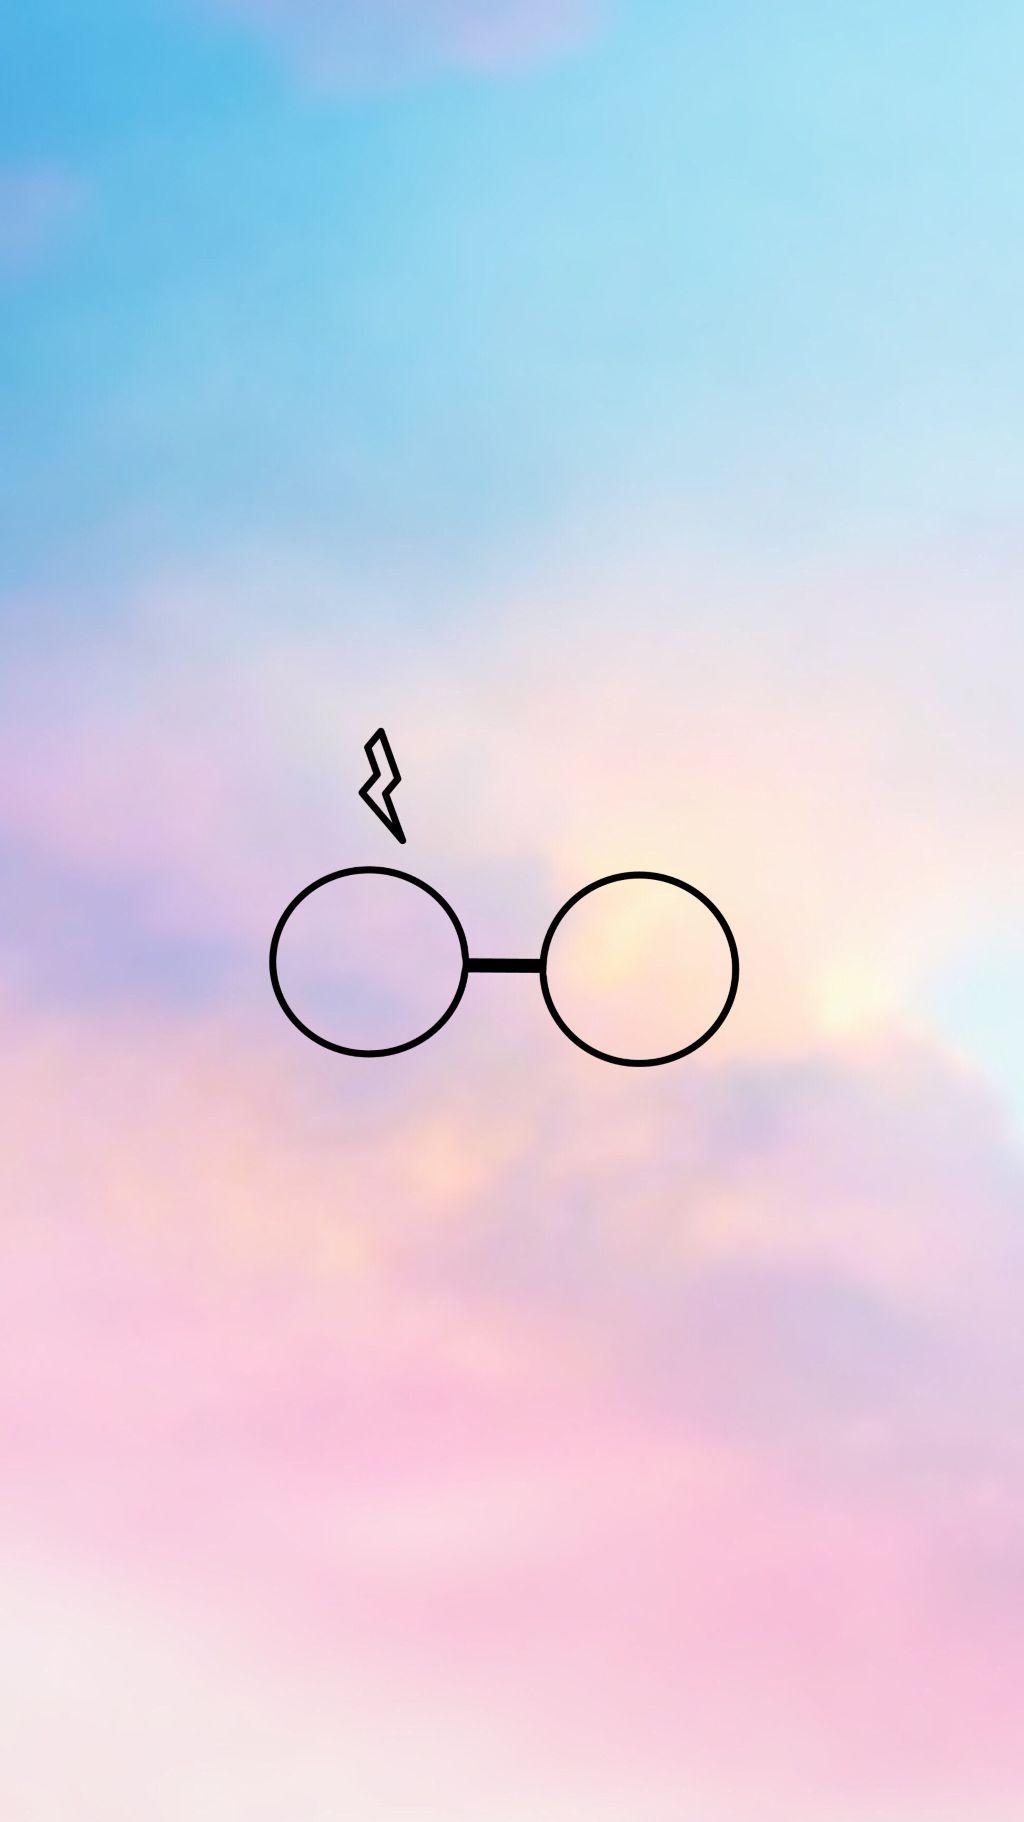 #freetoedit #wallpaper #lockscreen #tumblr #harrypotter - Lock Screen Harry Potter - HD Wallpaper